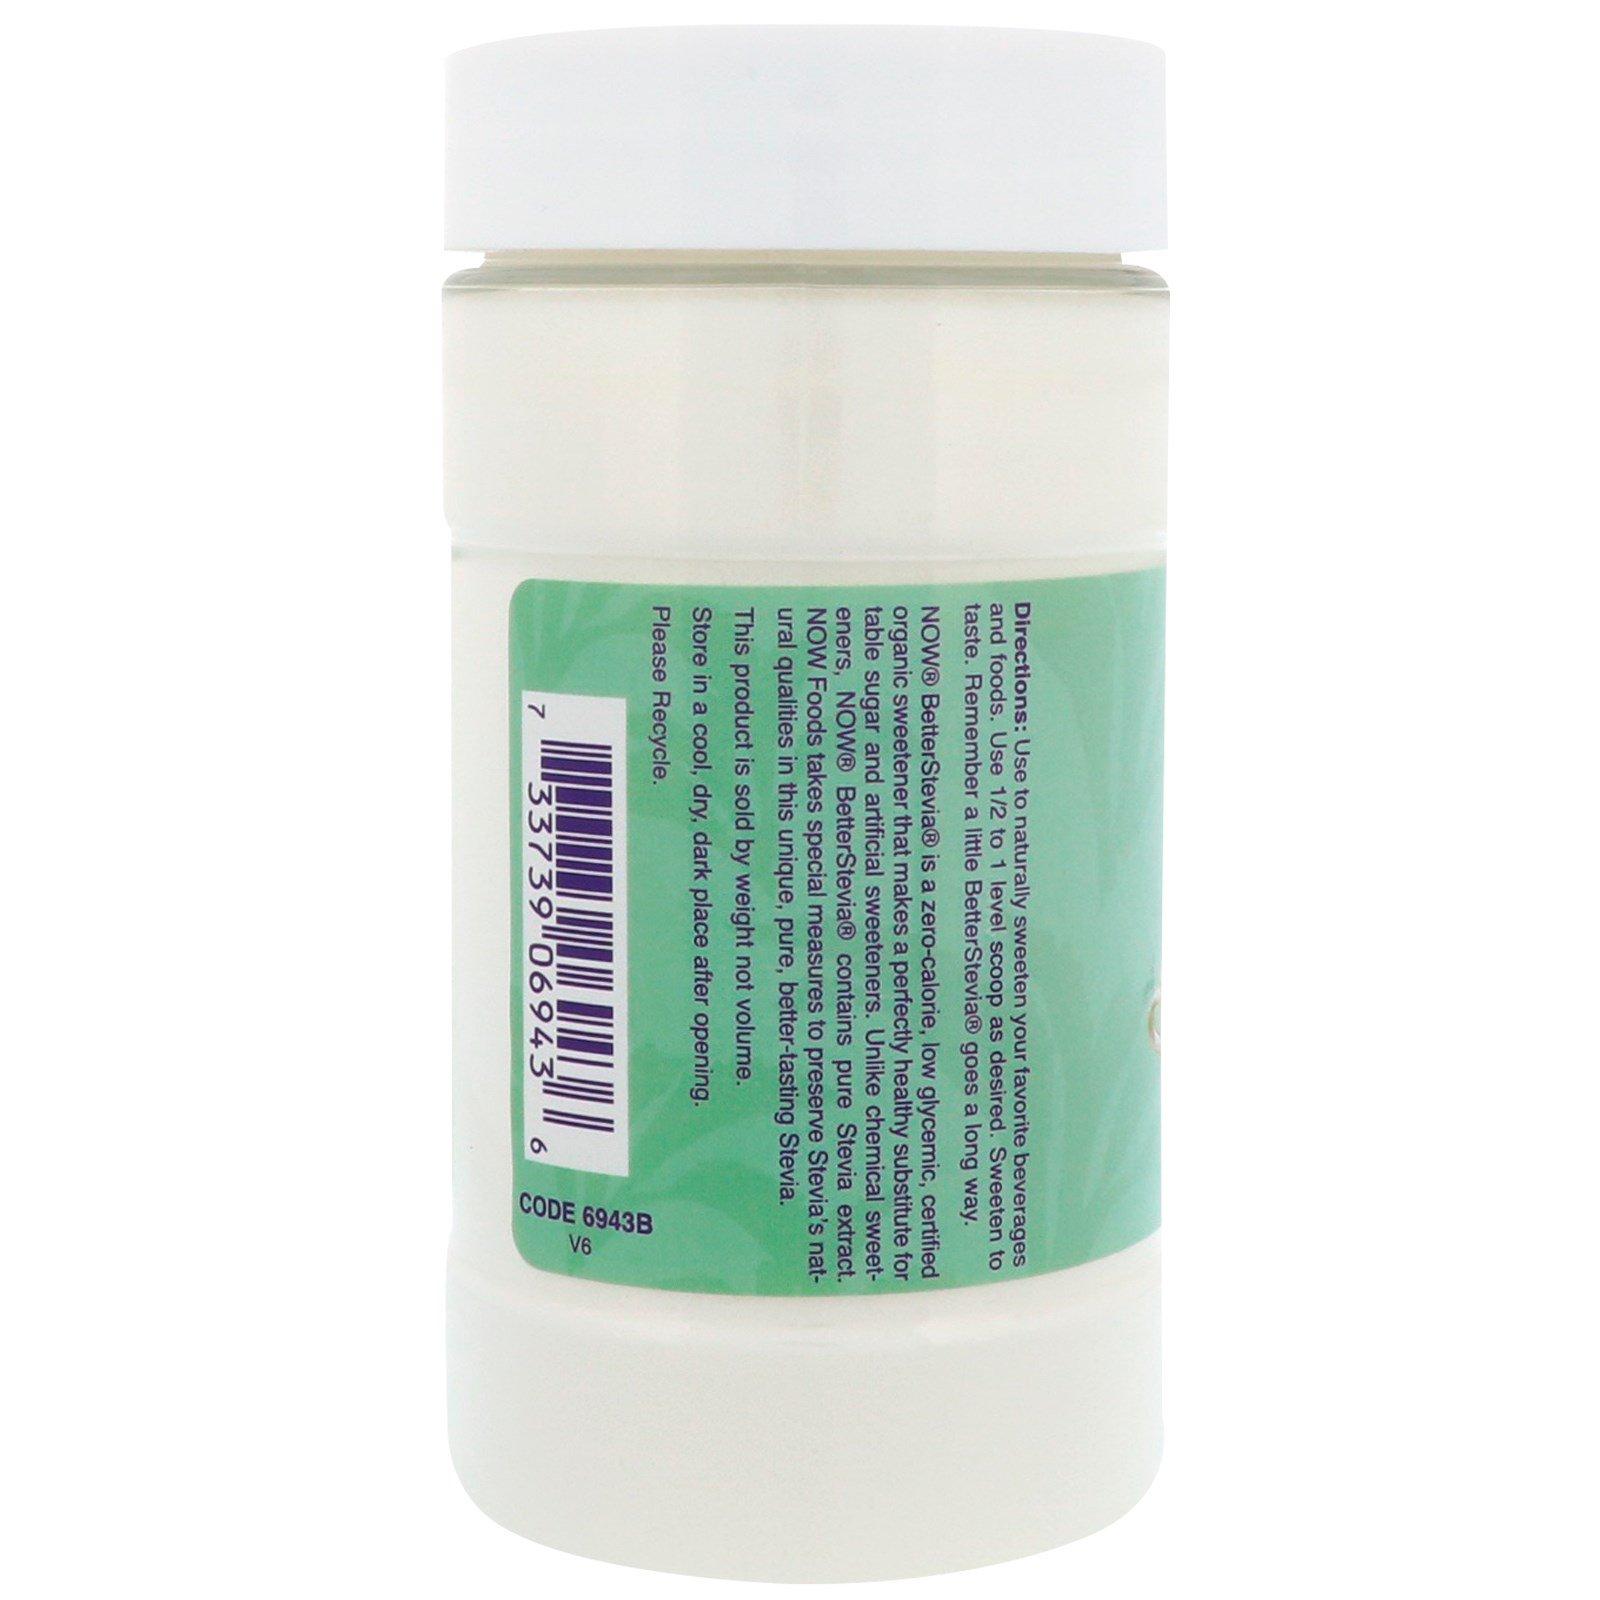 Now Foods Organic Better Stevia Powder